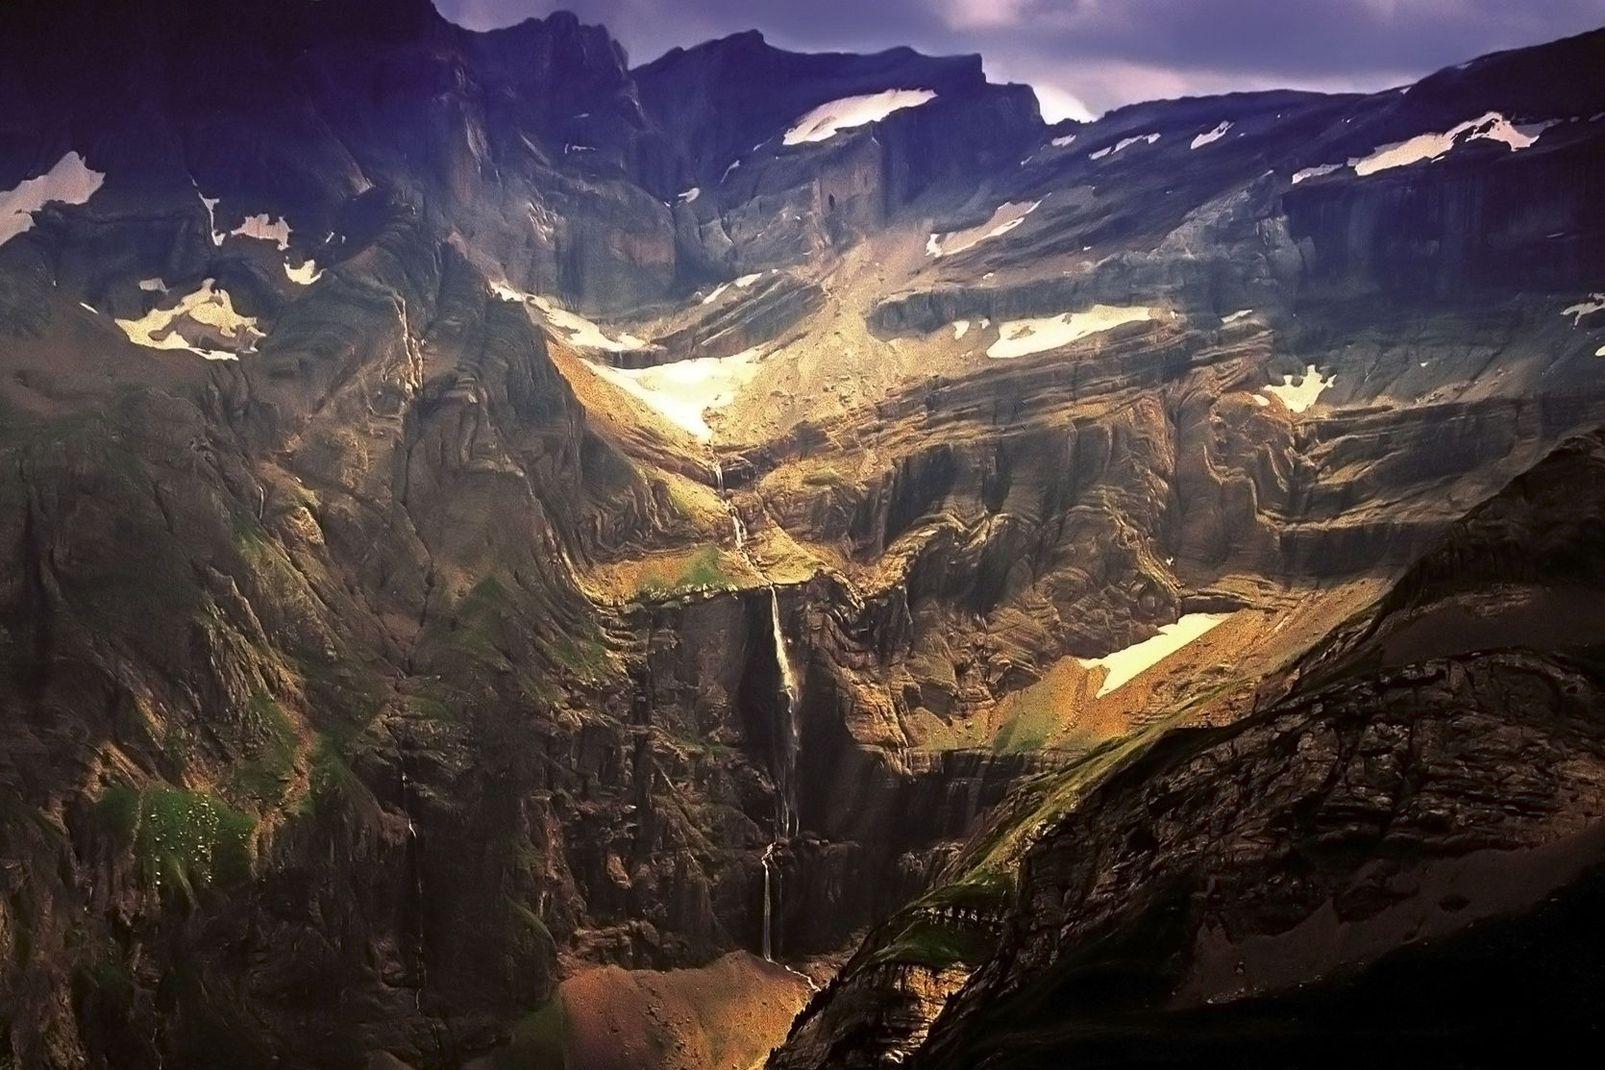 pyrenees, france, europe, midi-pyrenees